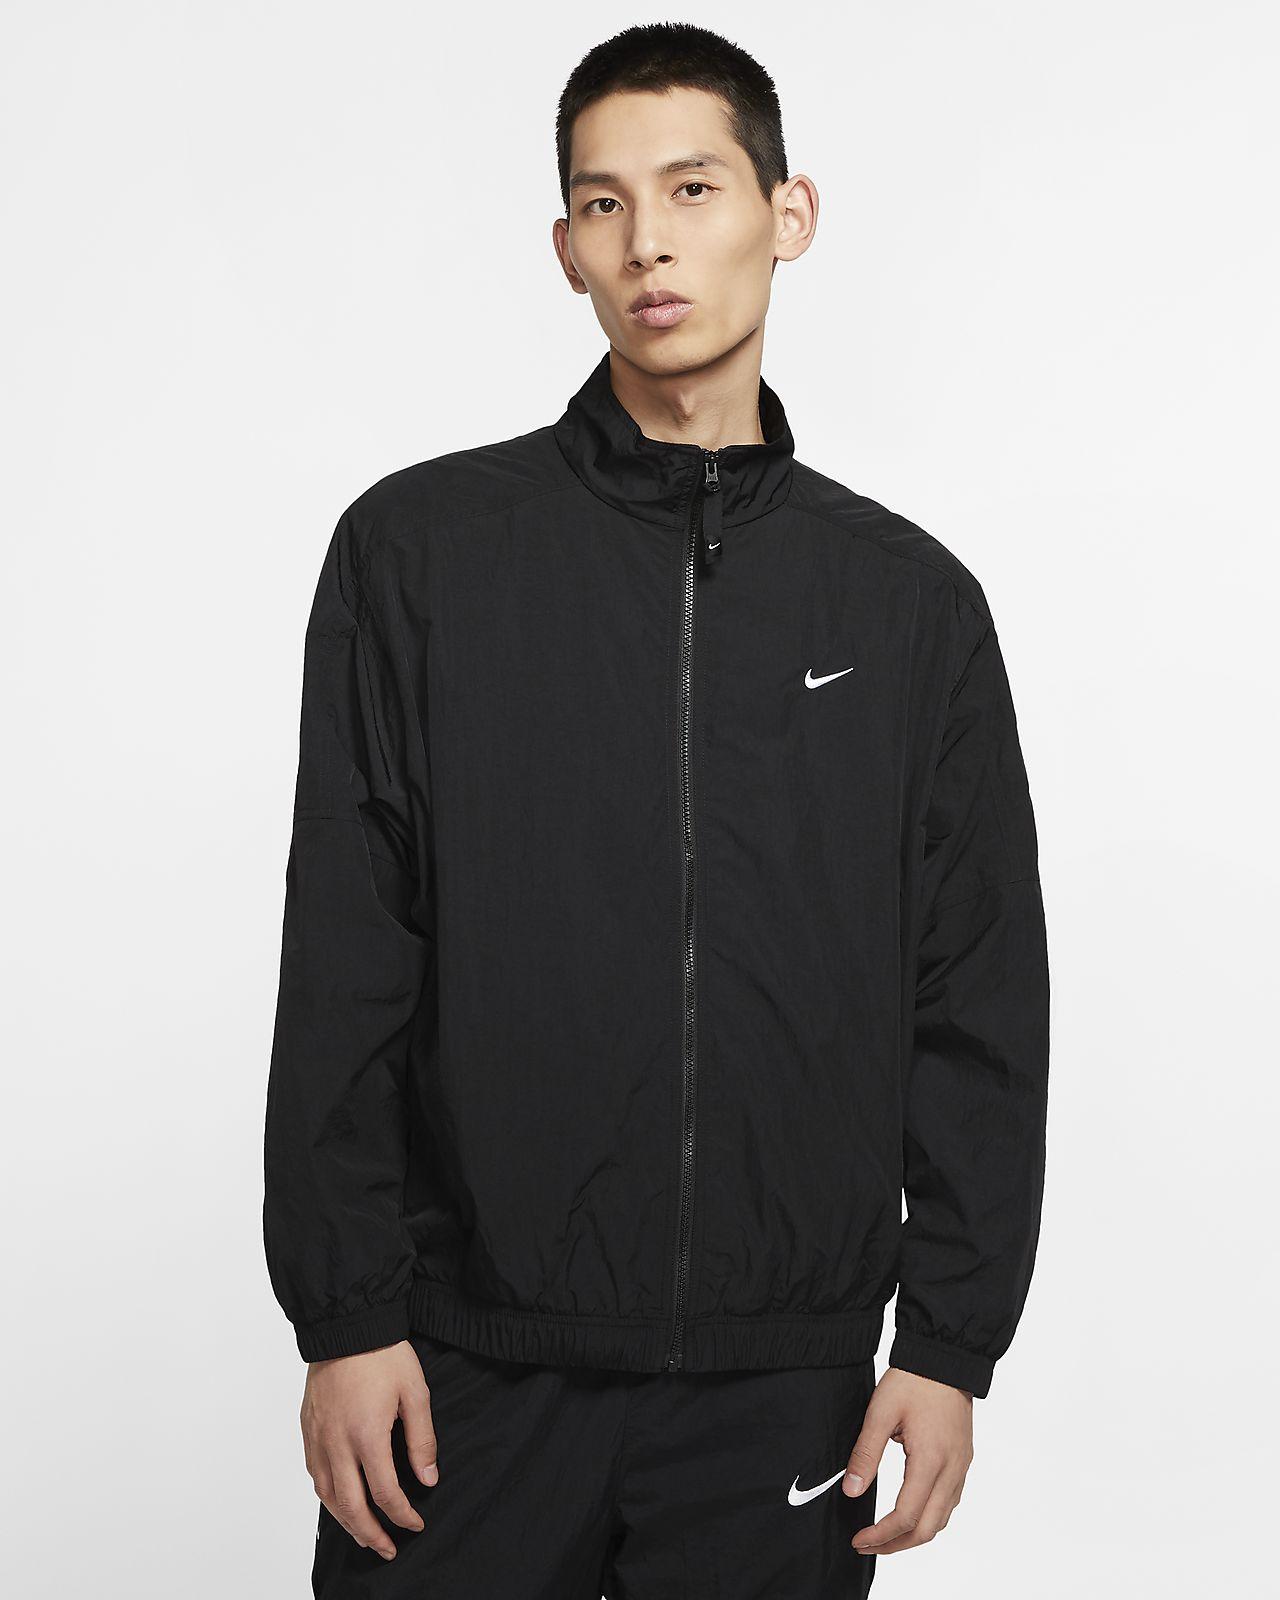 Nike Męska Bluza Dresowa Nikelab Fiolet